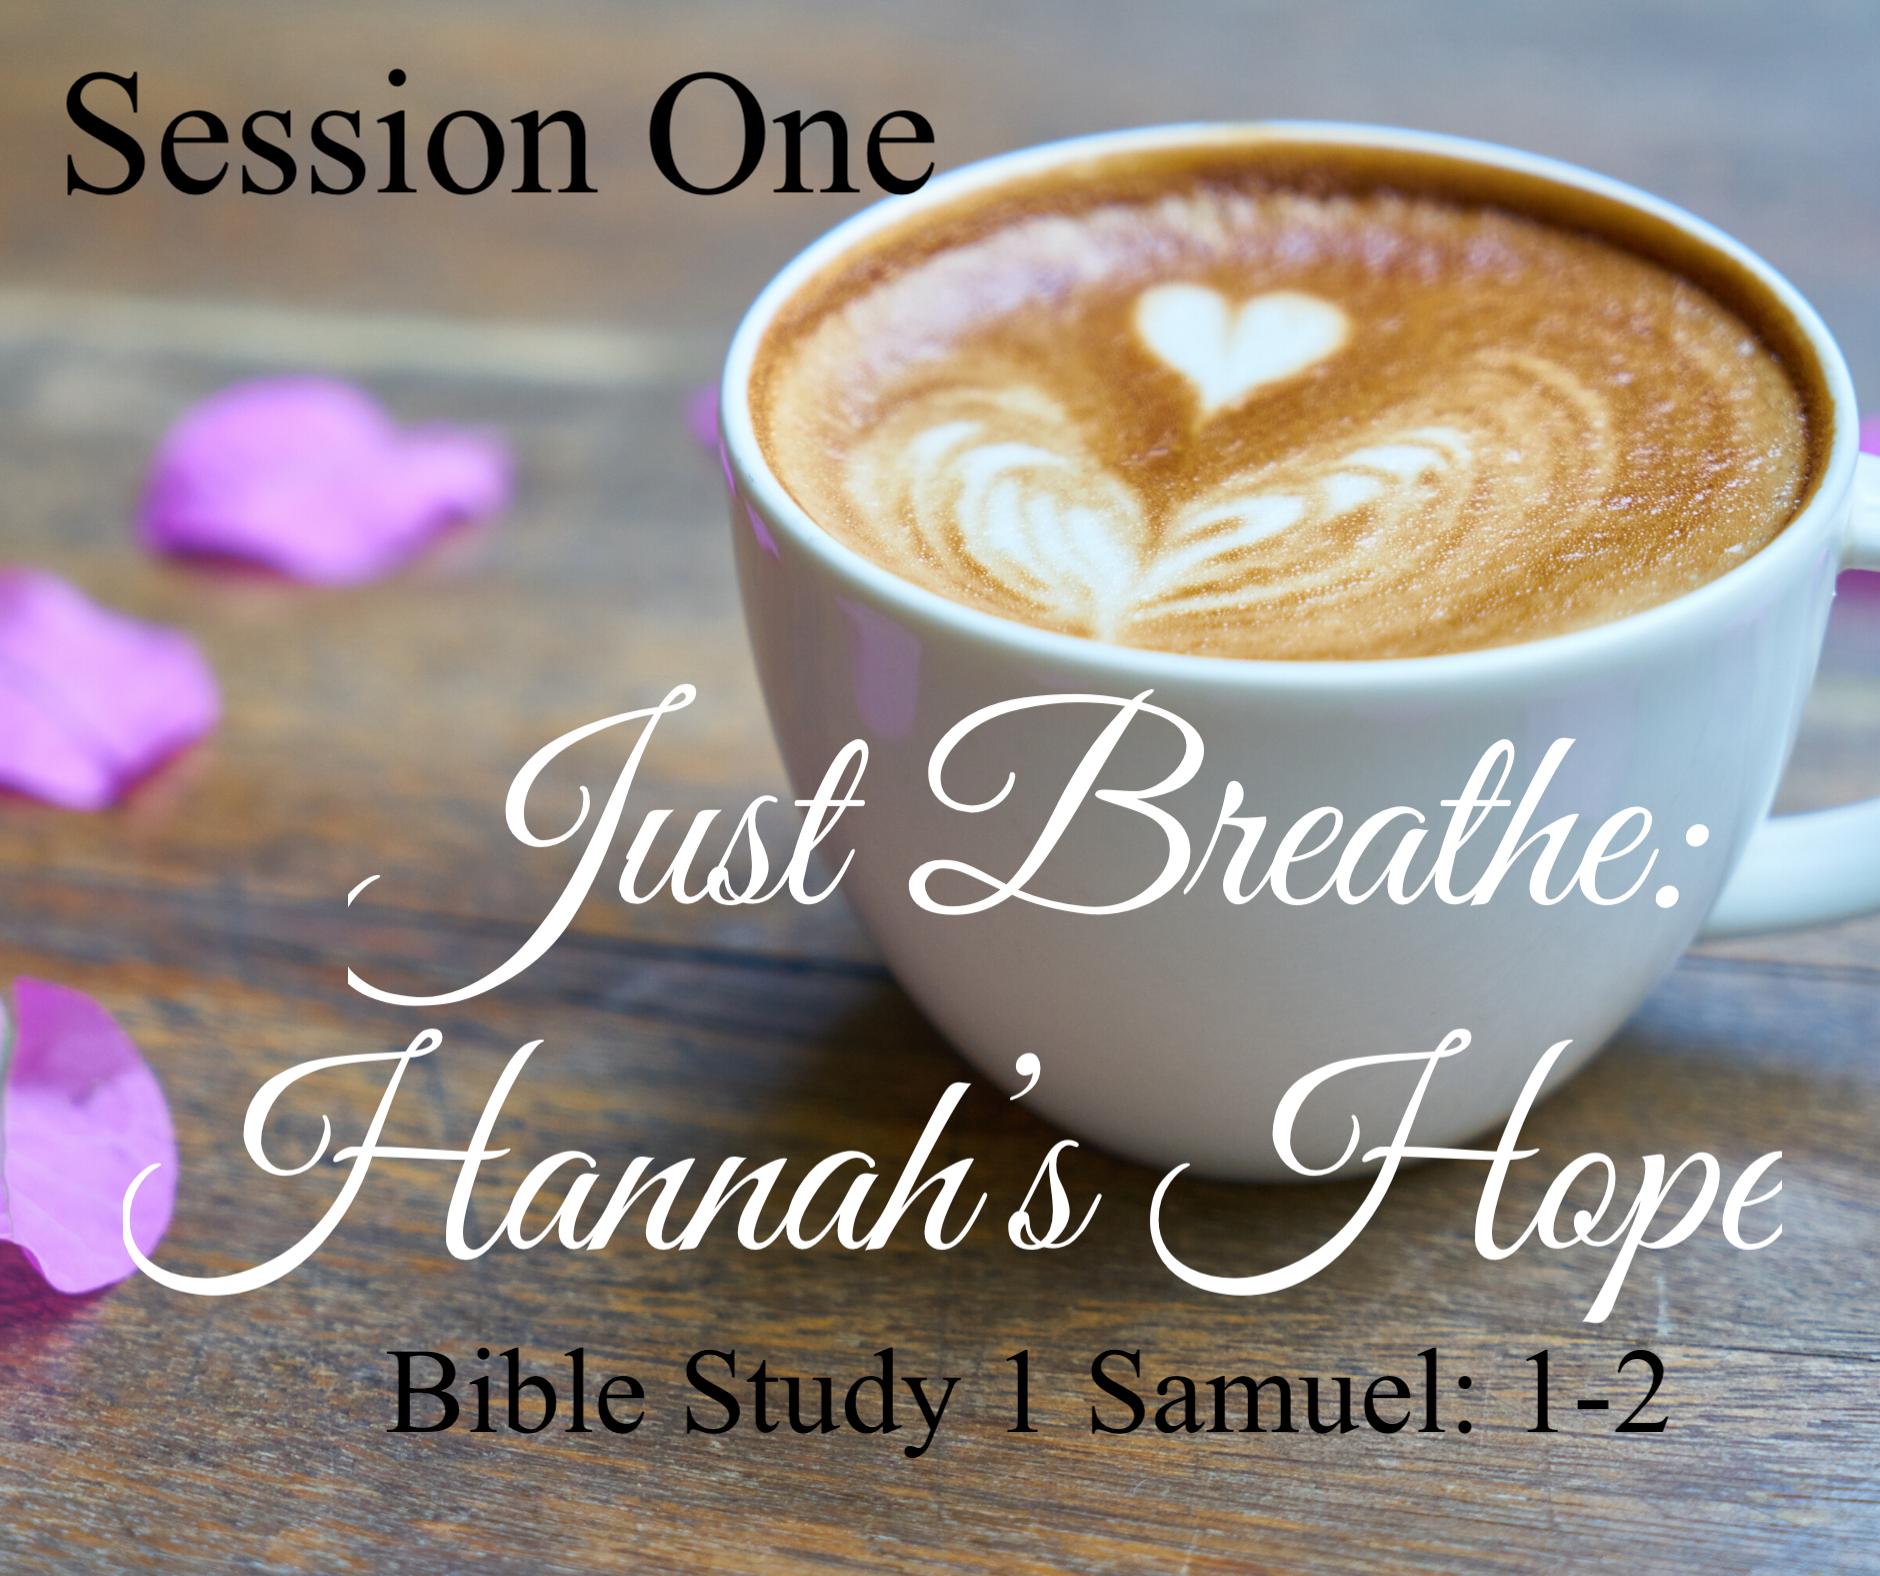 just breathe session 1 hannah